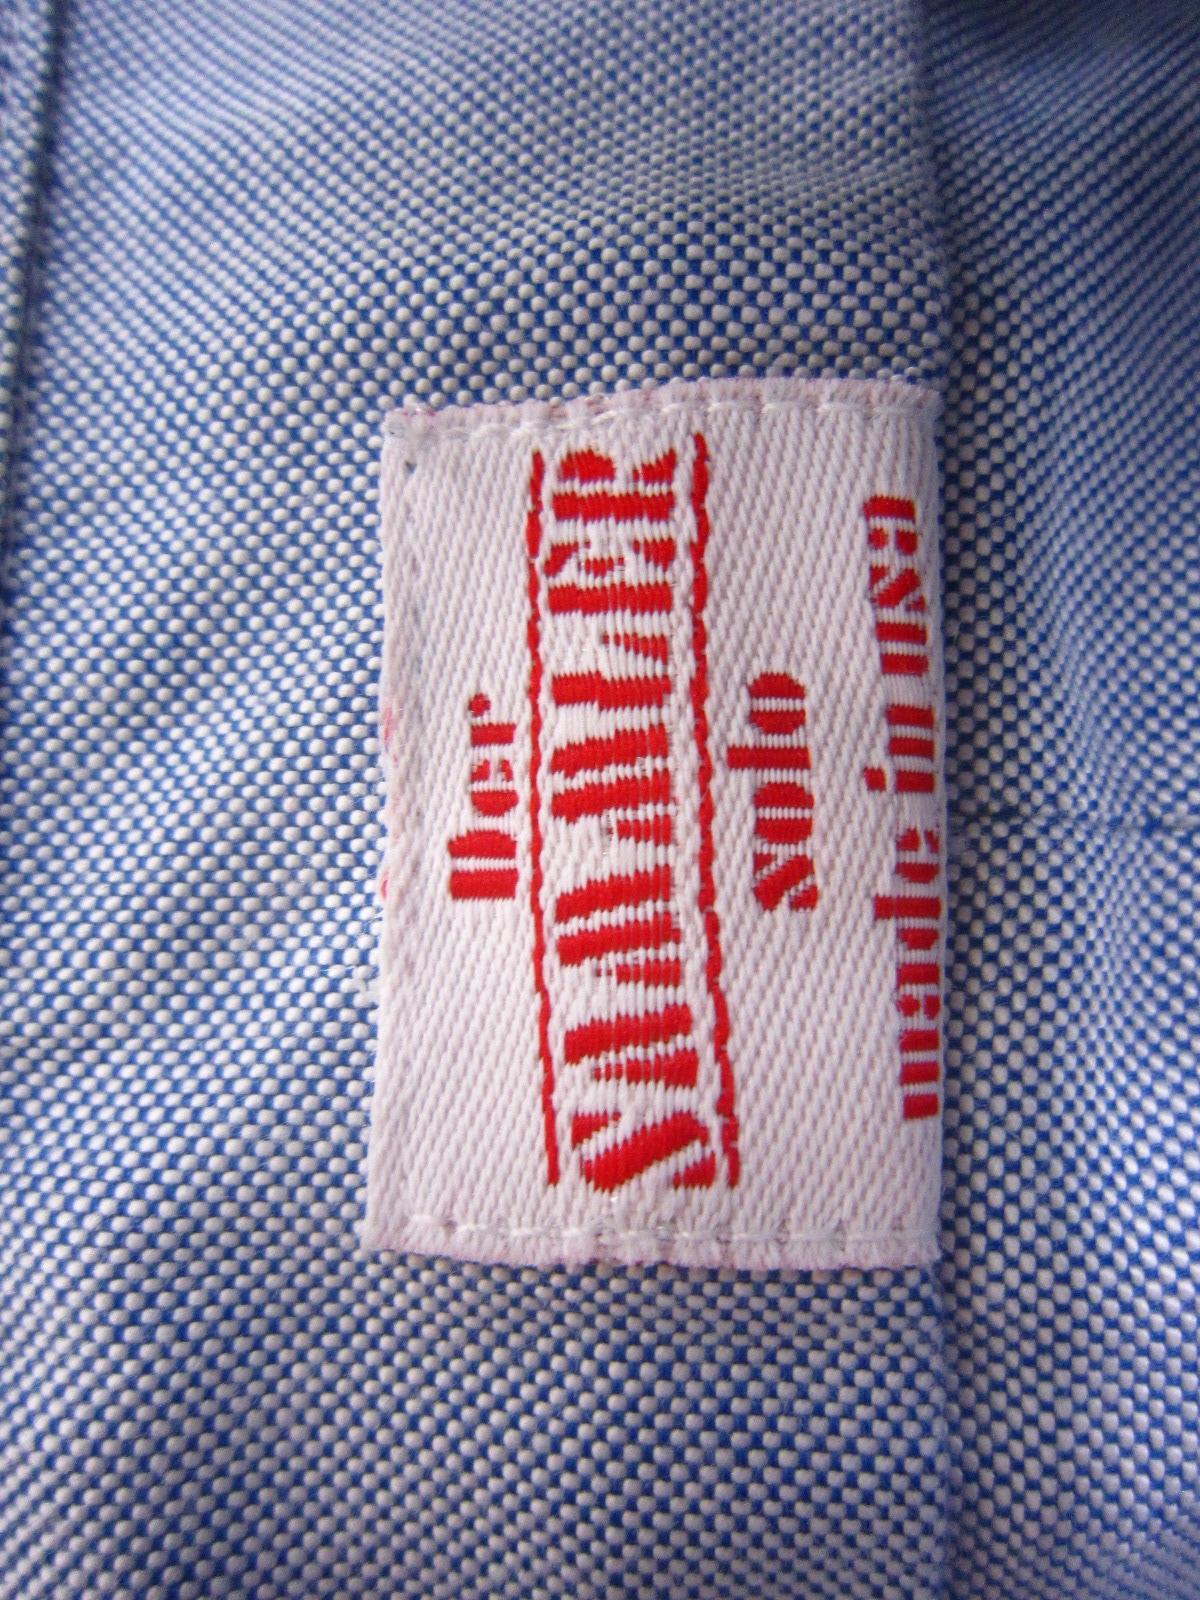 Der SAMMLER SOLO(ディア ザムラーソロ)のシャツ